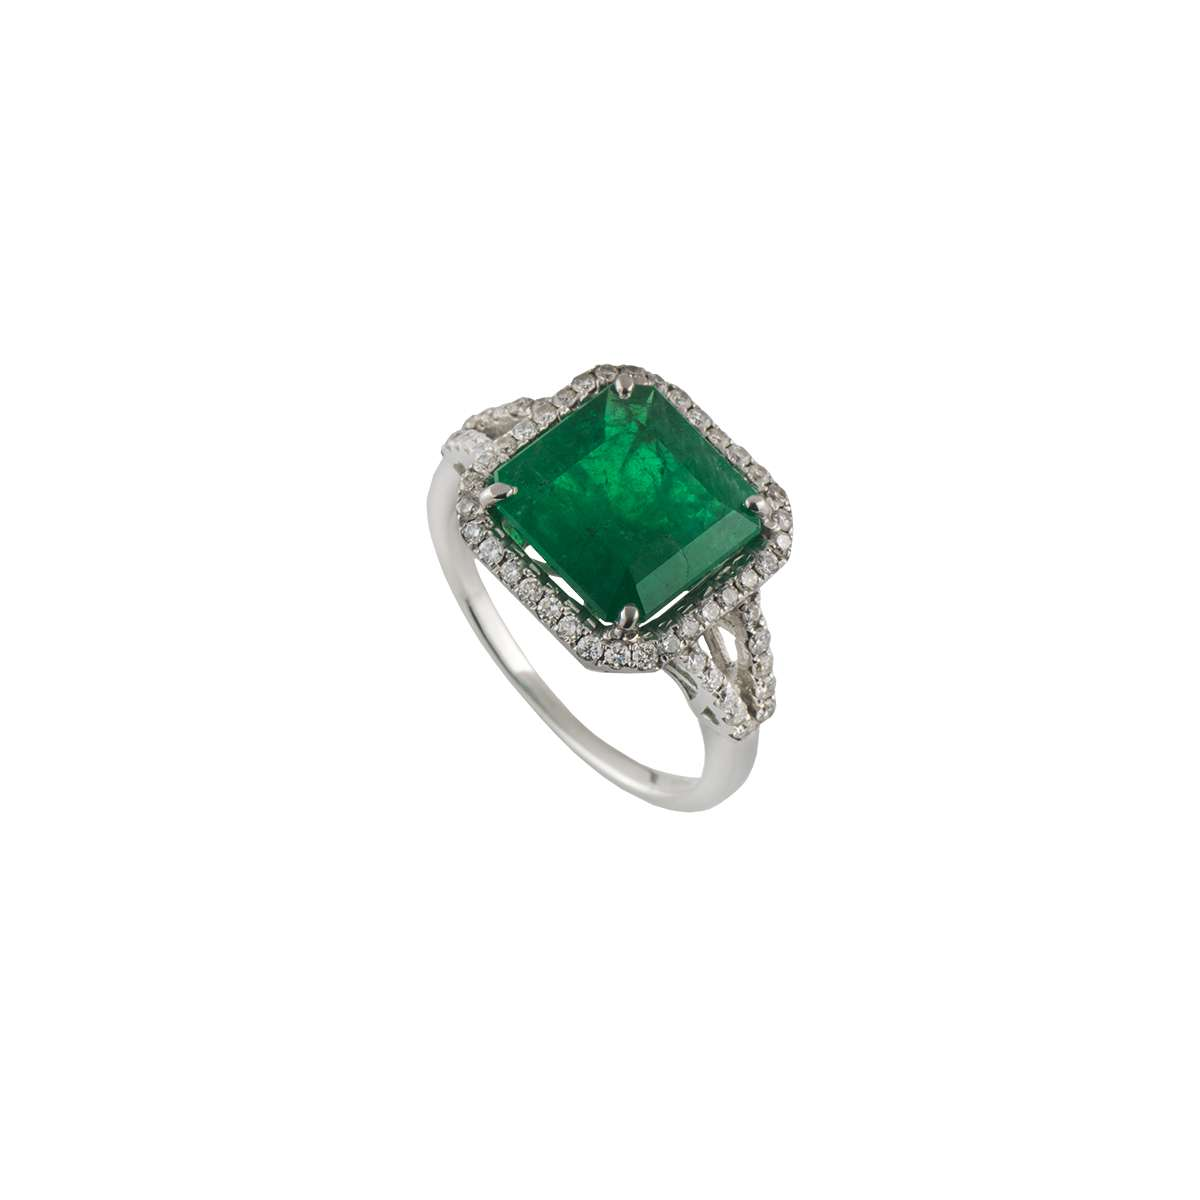 18k White Gold Emerald and Diamond Dress Ring 3.72ct